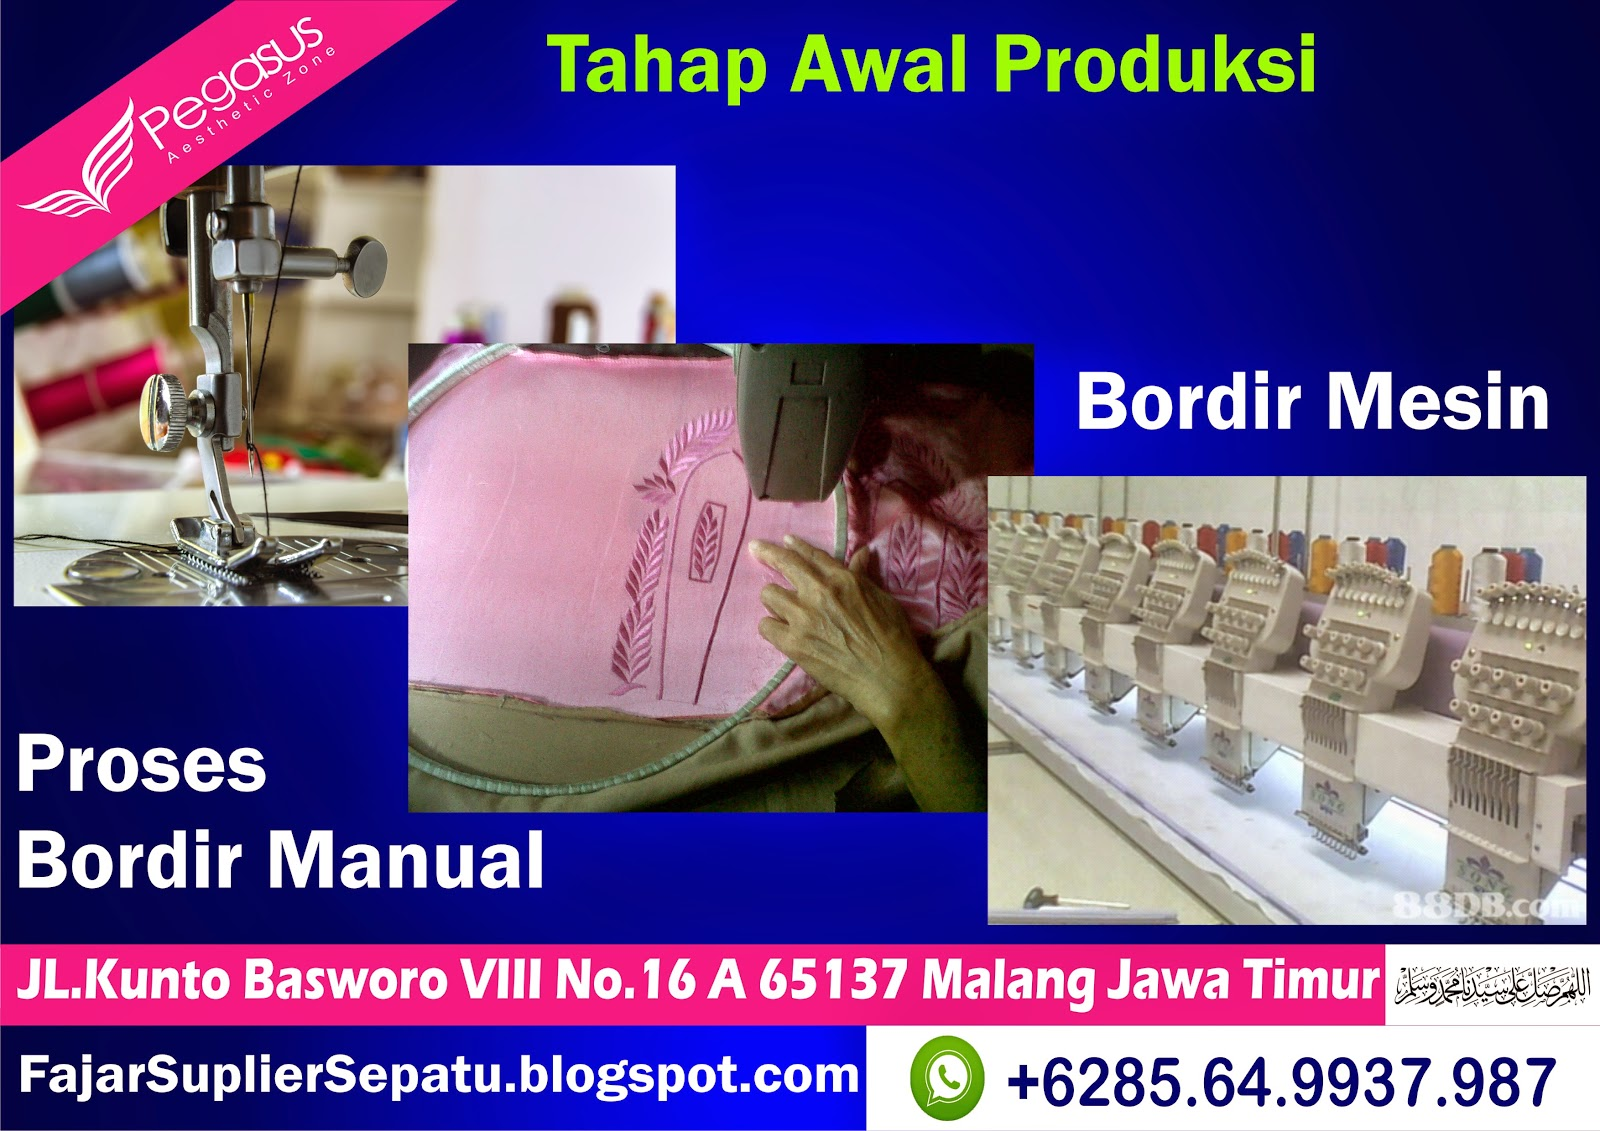 Distributor Sepatu Bordir Murah, Produsen Sepatu Bordir Murah, Pabrik Sepatu Bordir, +62.8564.993.7987